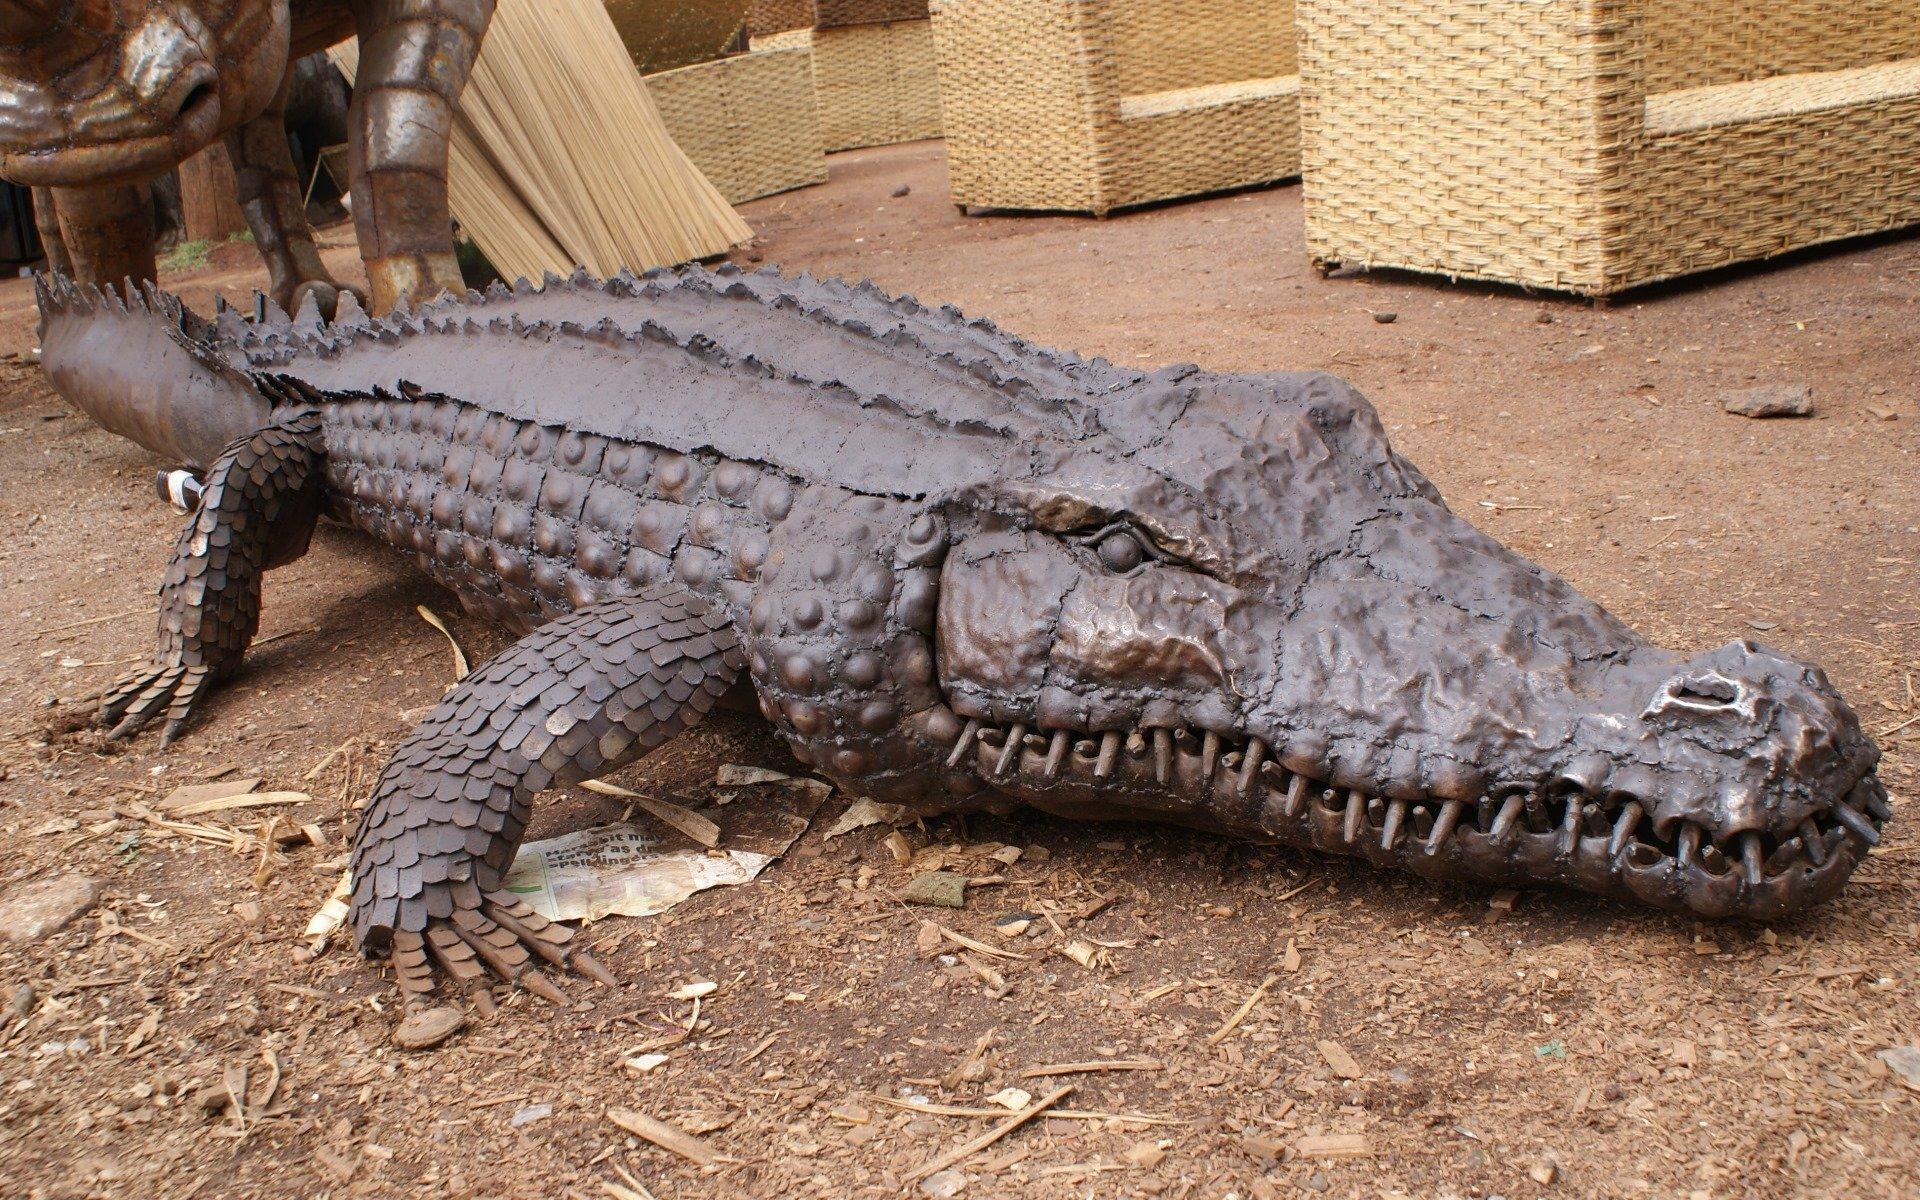 A life size statue of a nile crocodile by the Dagoretti Artisans